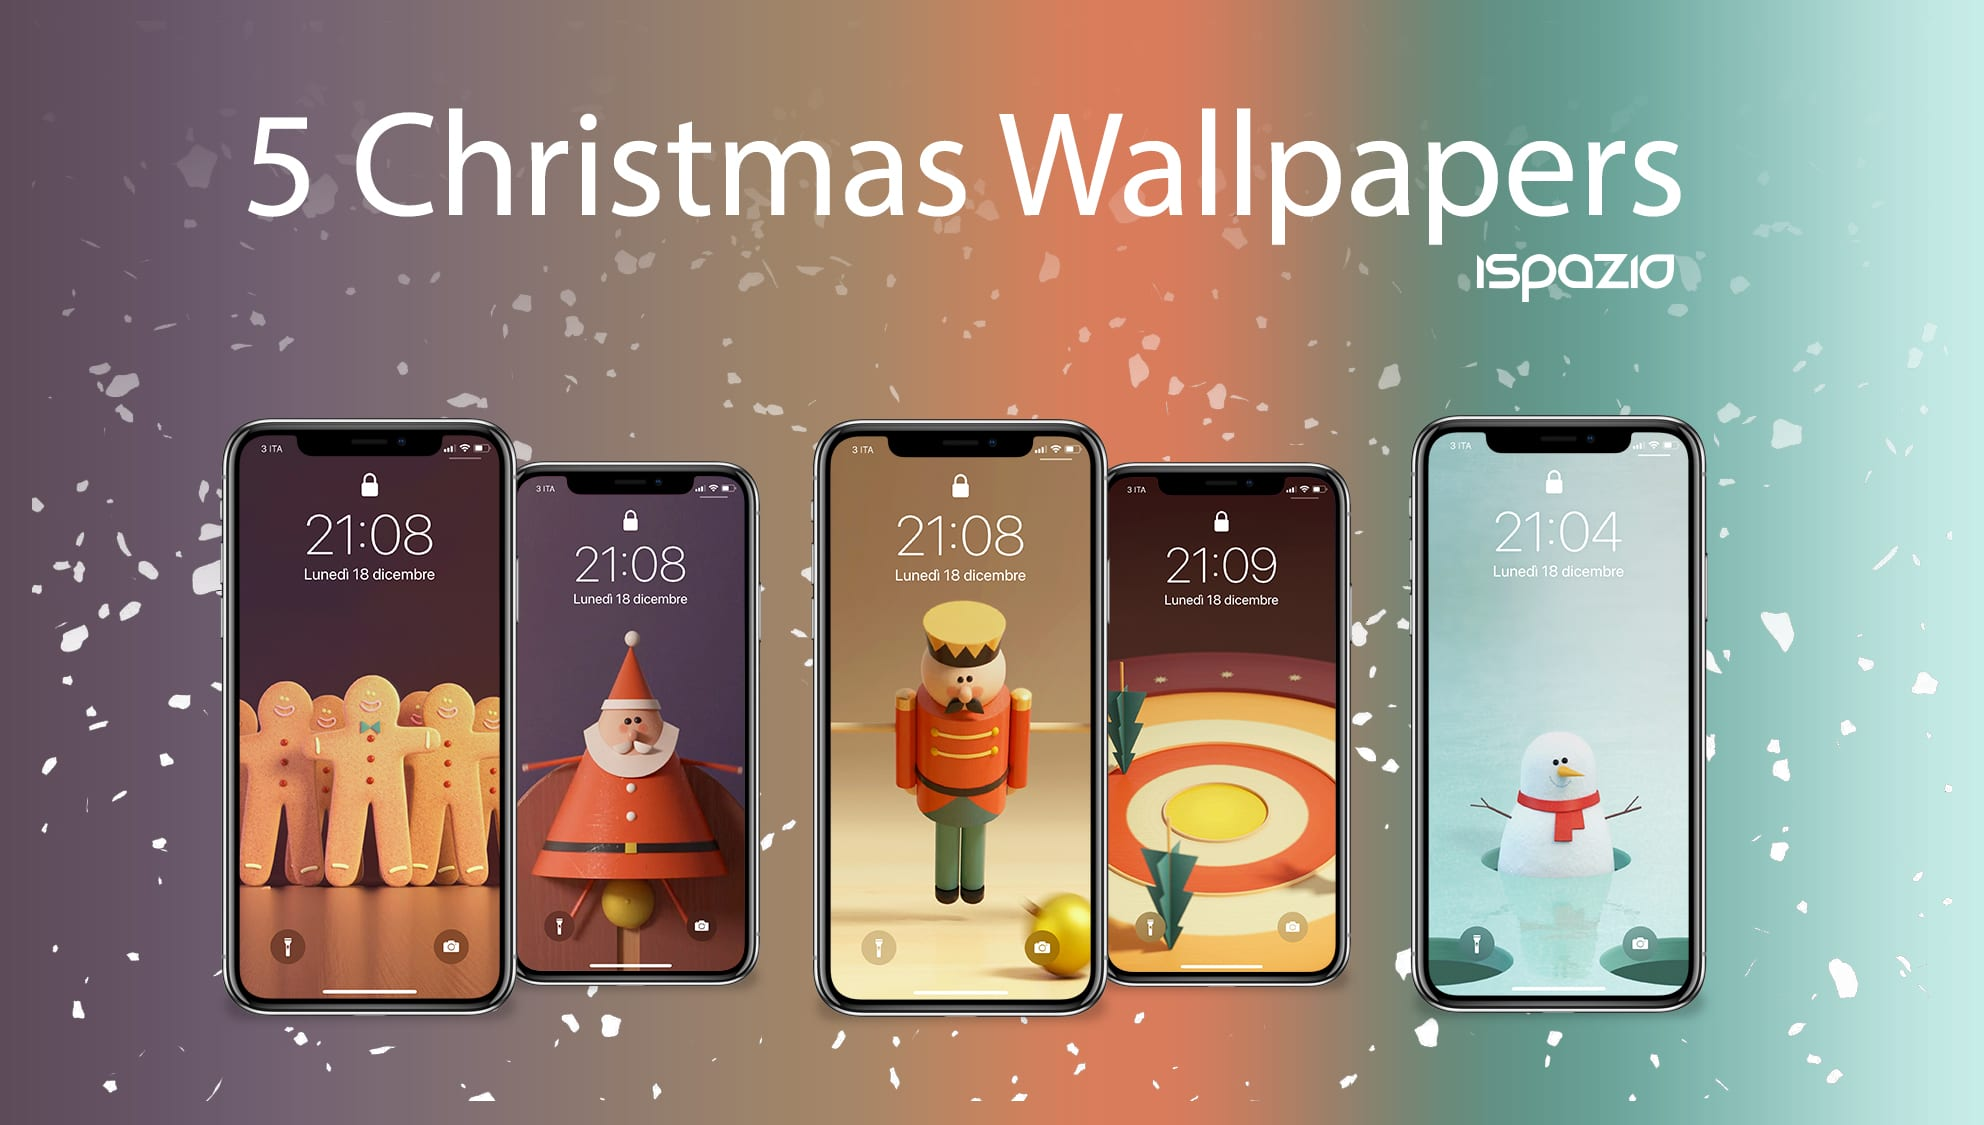 Youtube Sfondi Natalizi.Natale E Alle Porte Altri 8 Sfondi Natalizi Per I Vostri Iphone Wallpaperselection 141 Ispazio